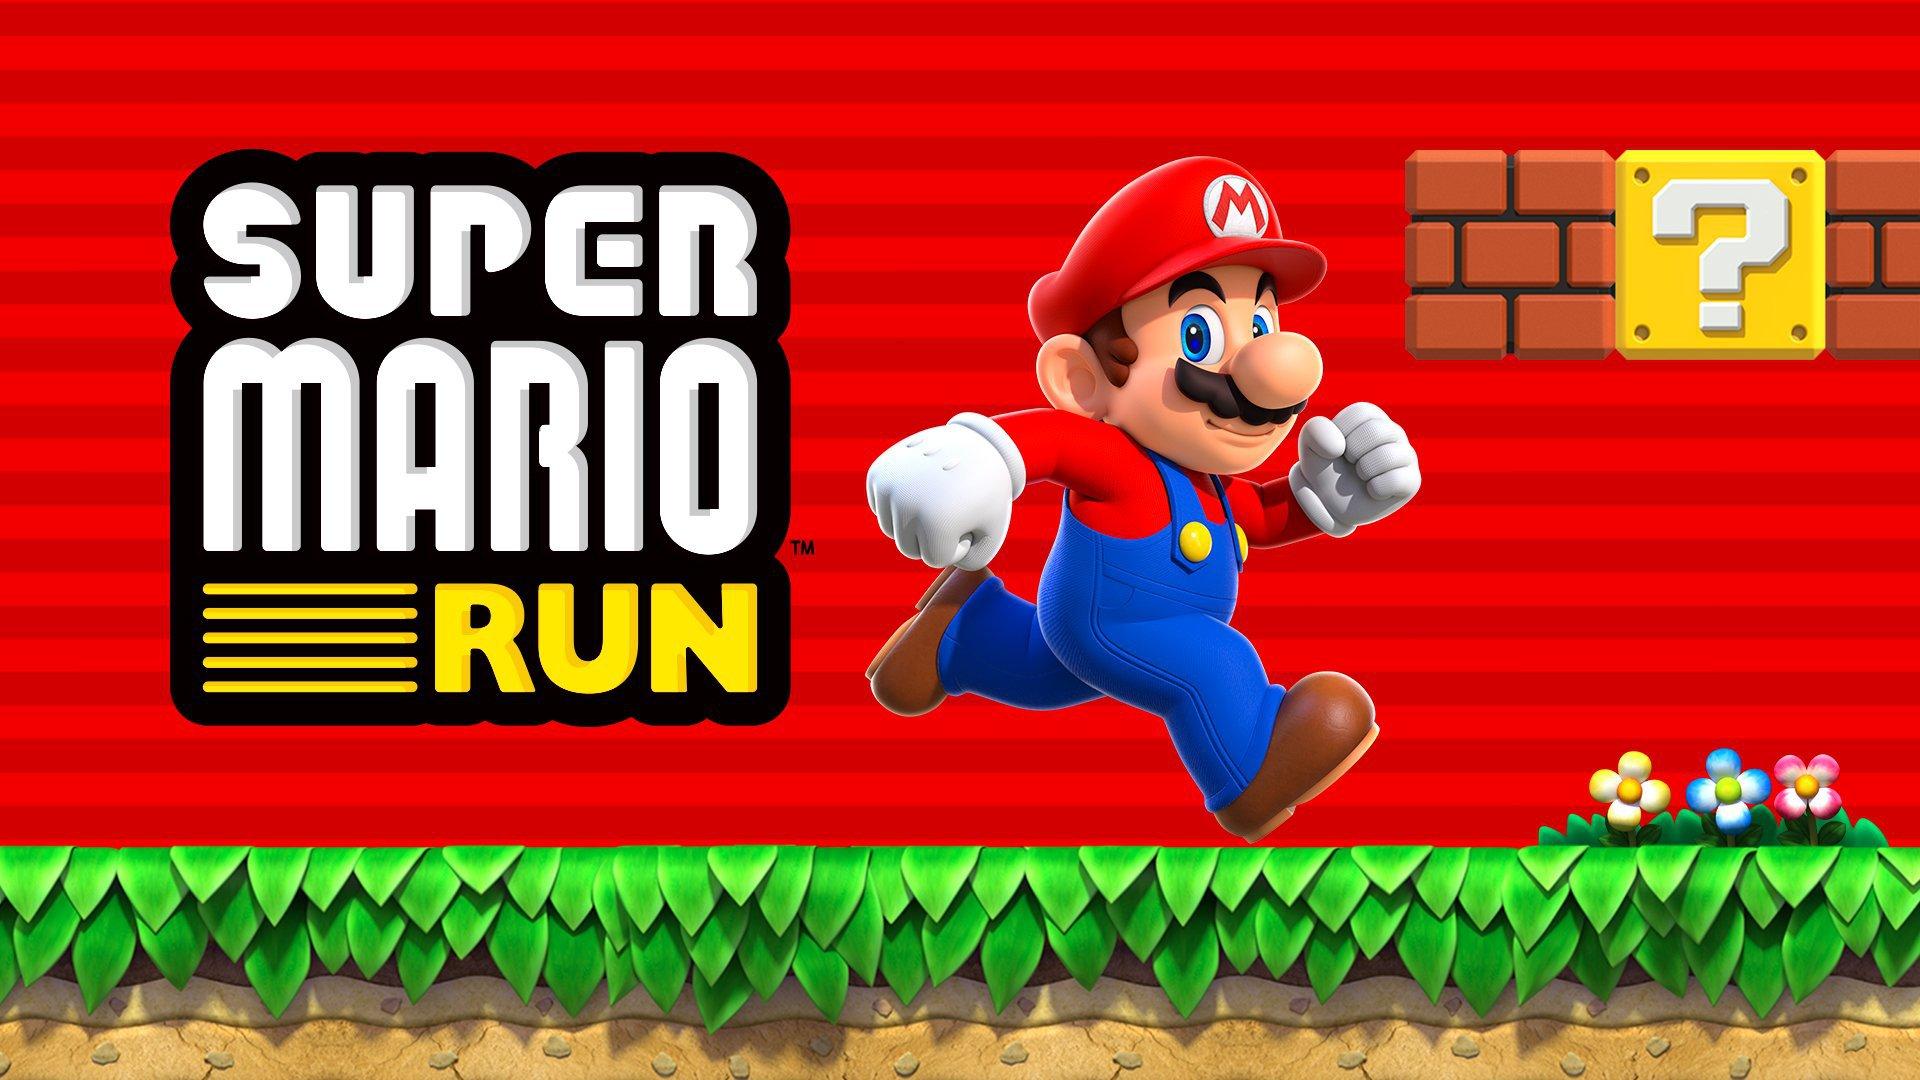 تحميل لعبة سوبر ماريو رن Super Mario Run